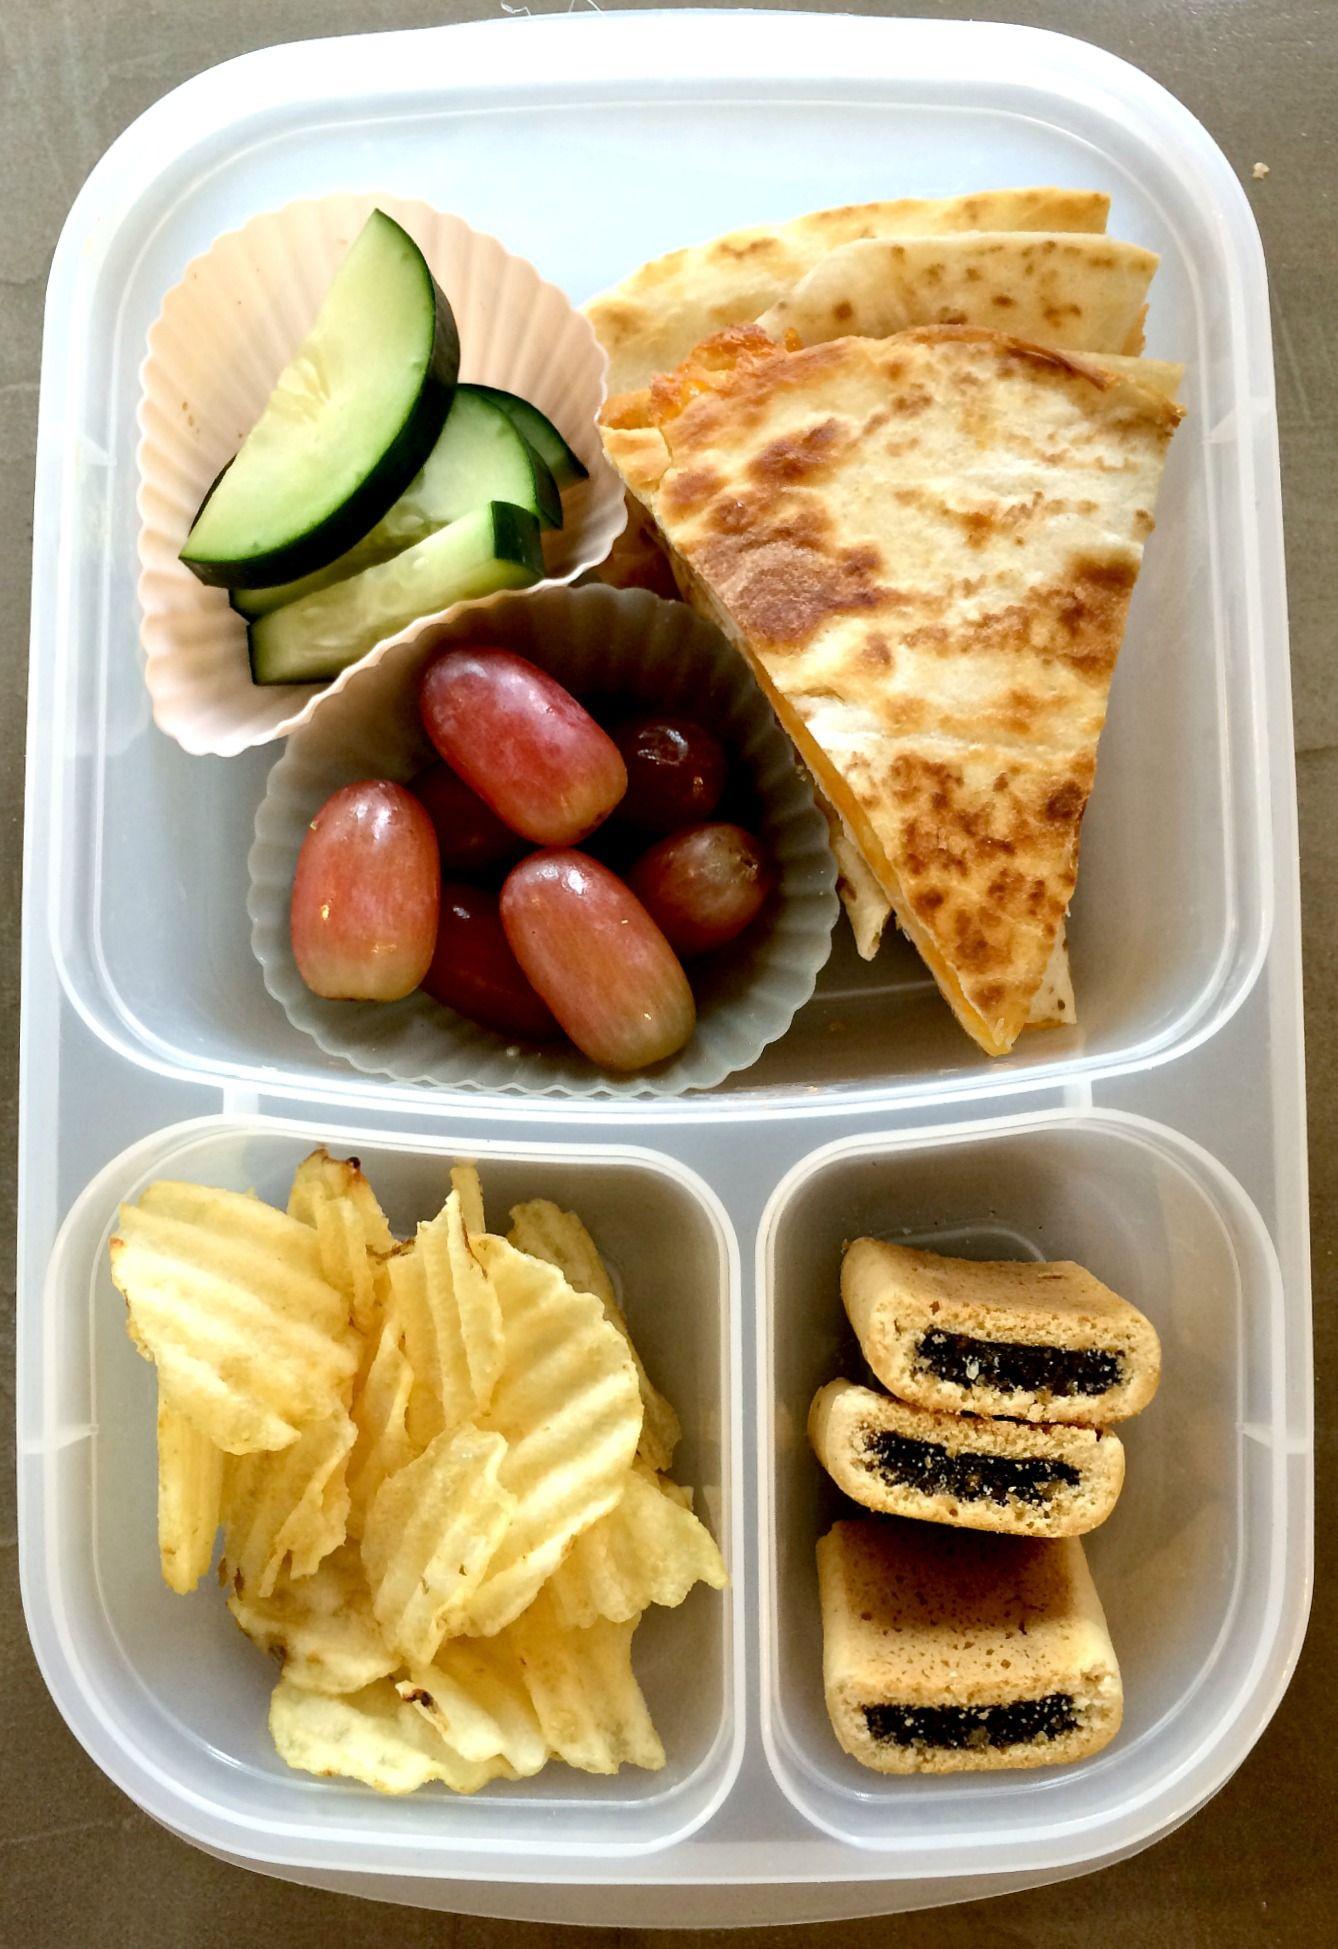 aldi lunch ideas your kids will love in 2018 | lunch | pinterest